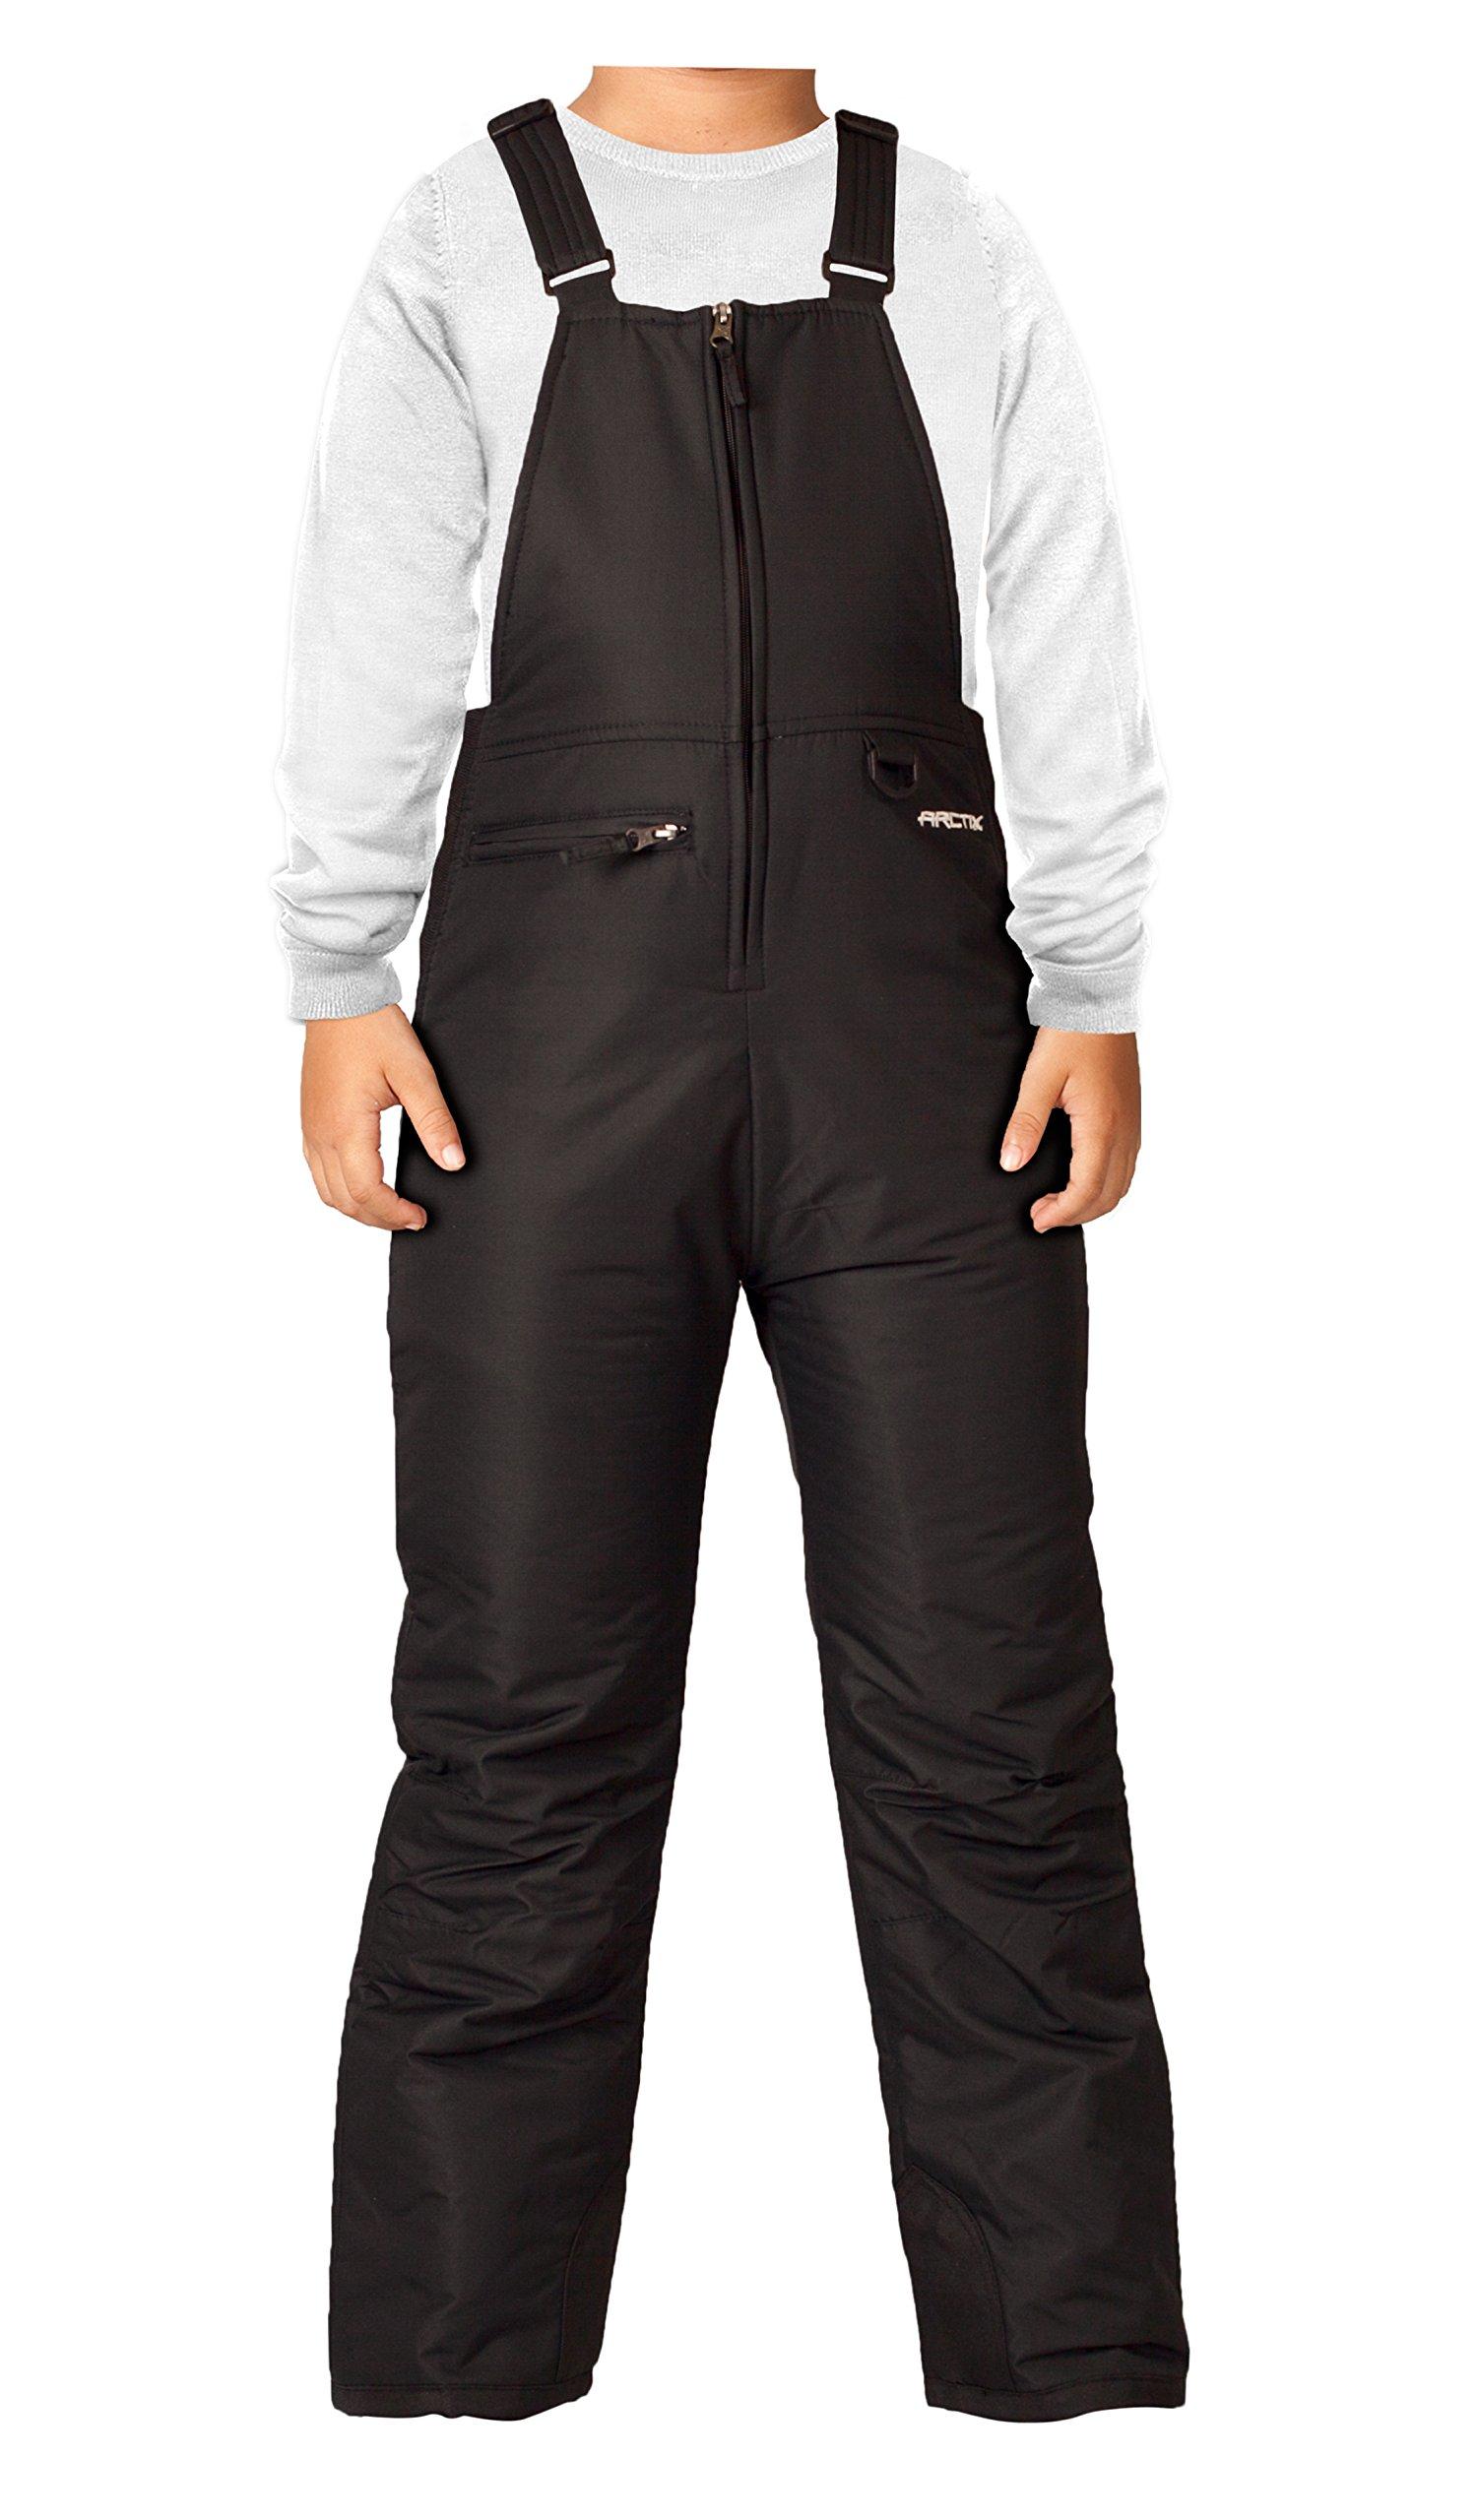 Arctix Youth Insulated Snow Bib Overalls, Black, X-Small/Regular